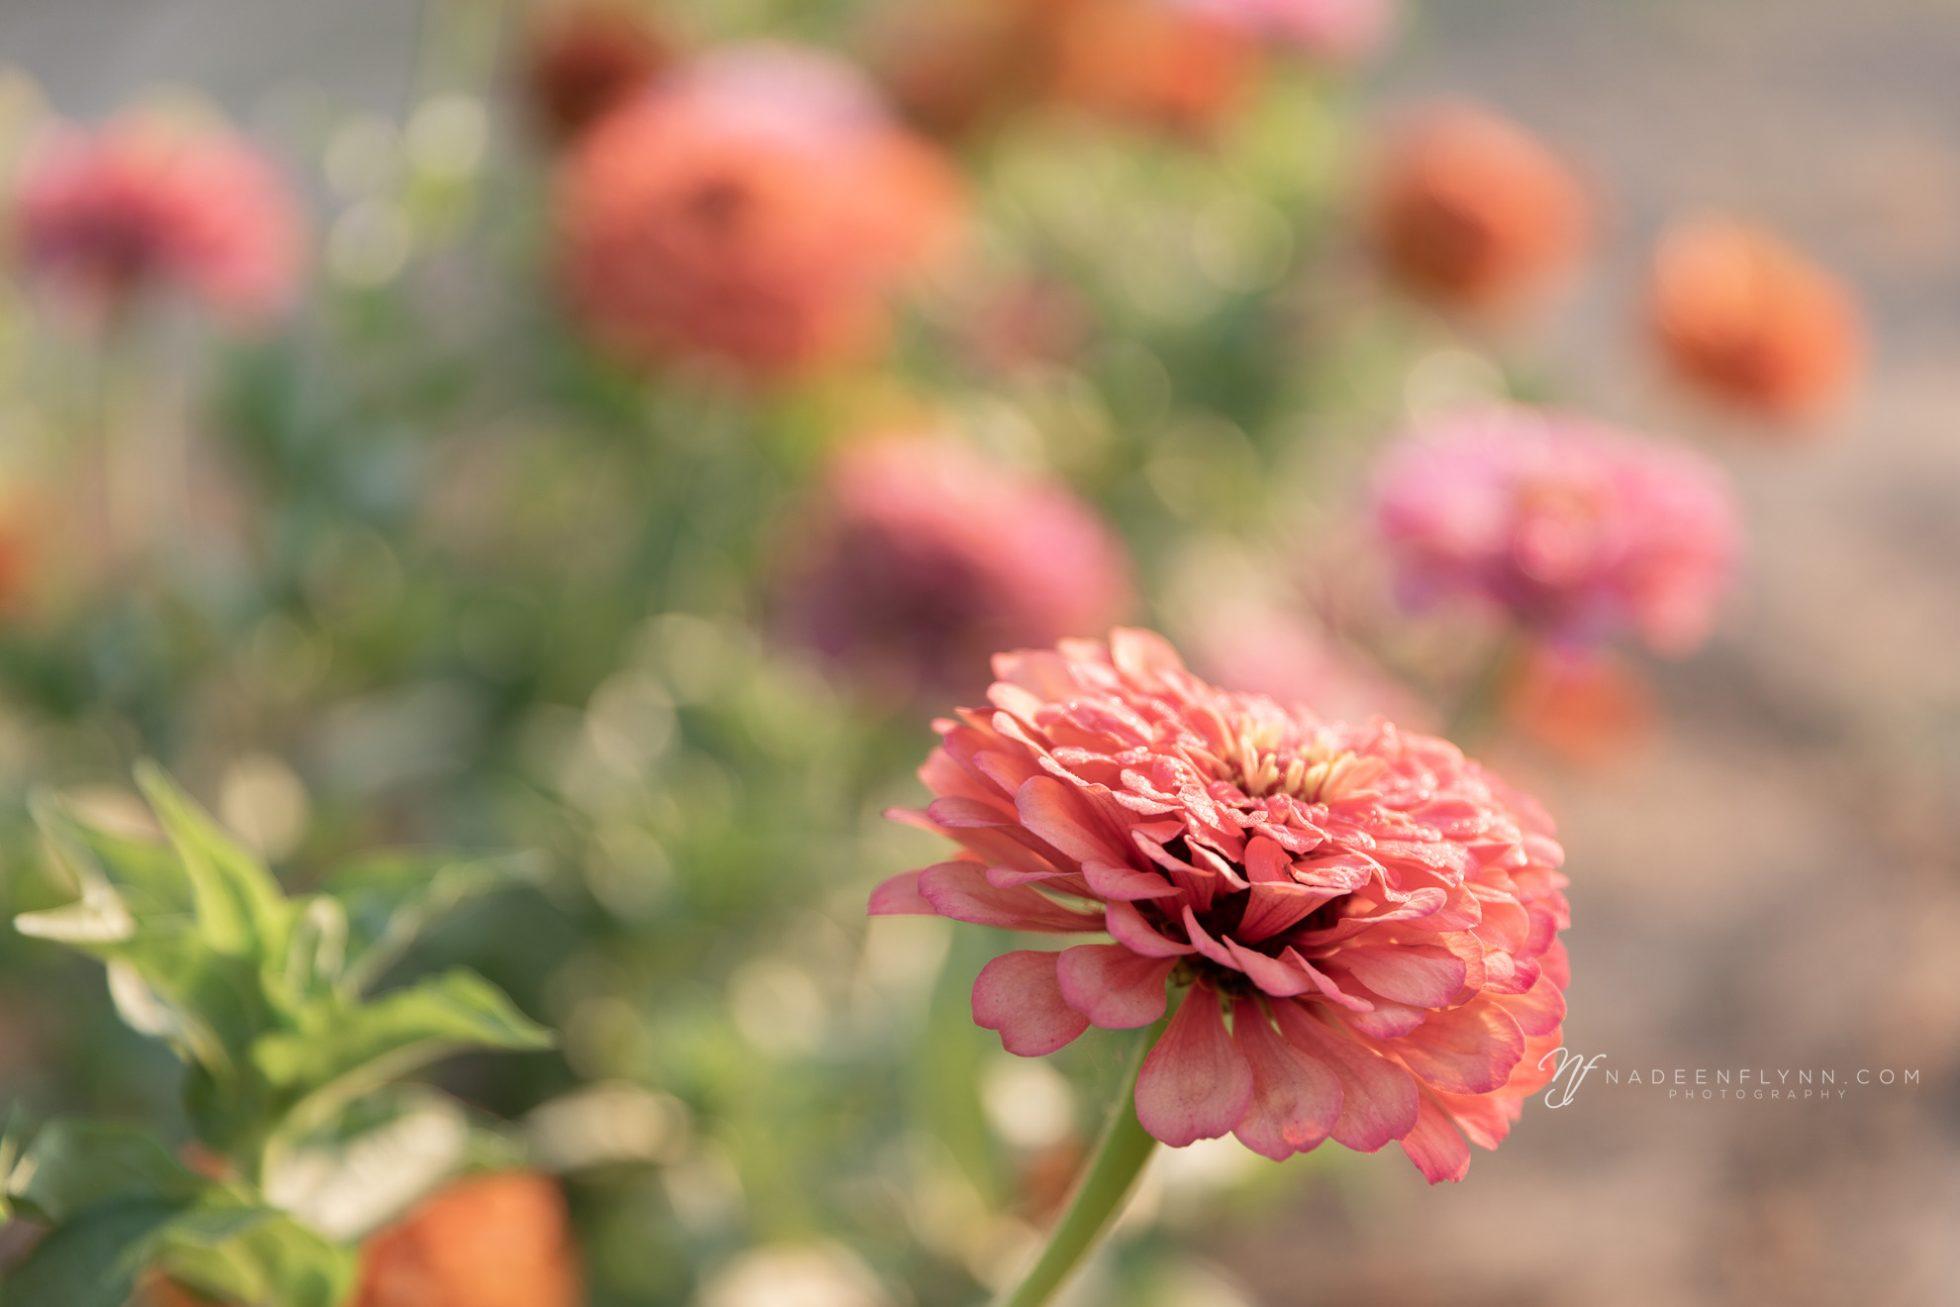 garden walk to see pink zinnias